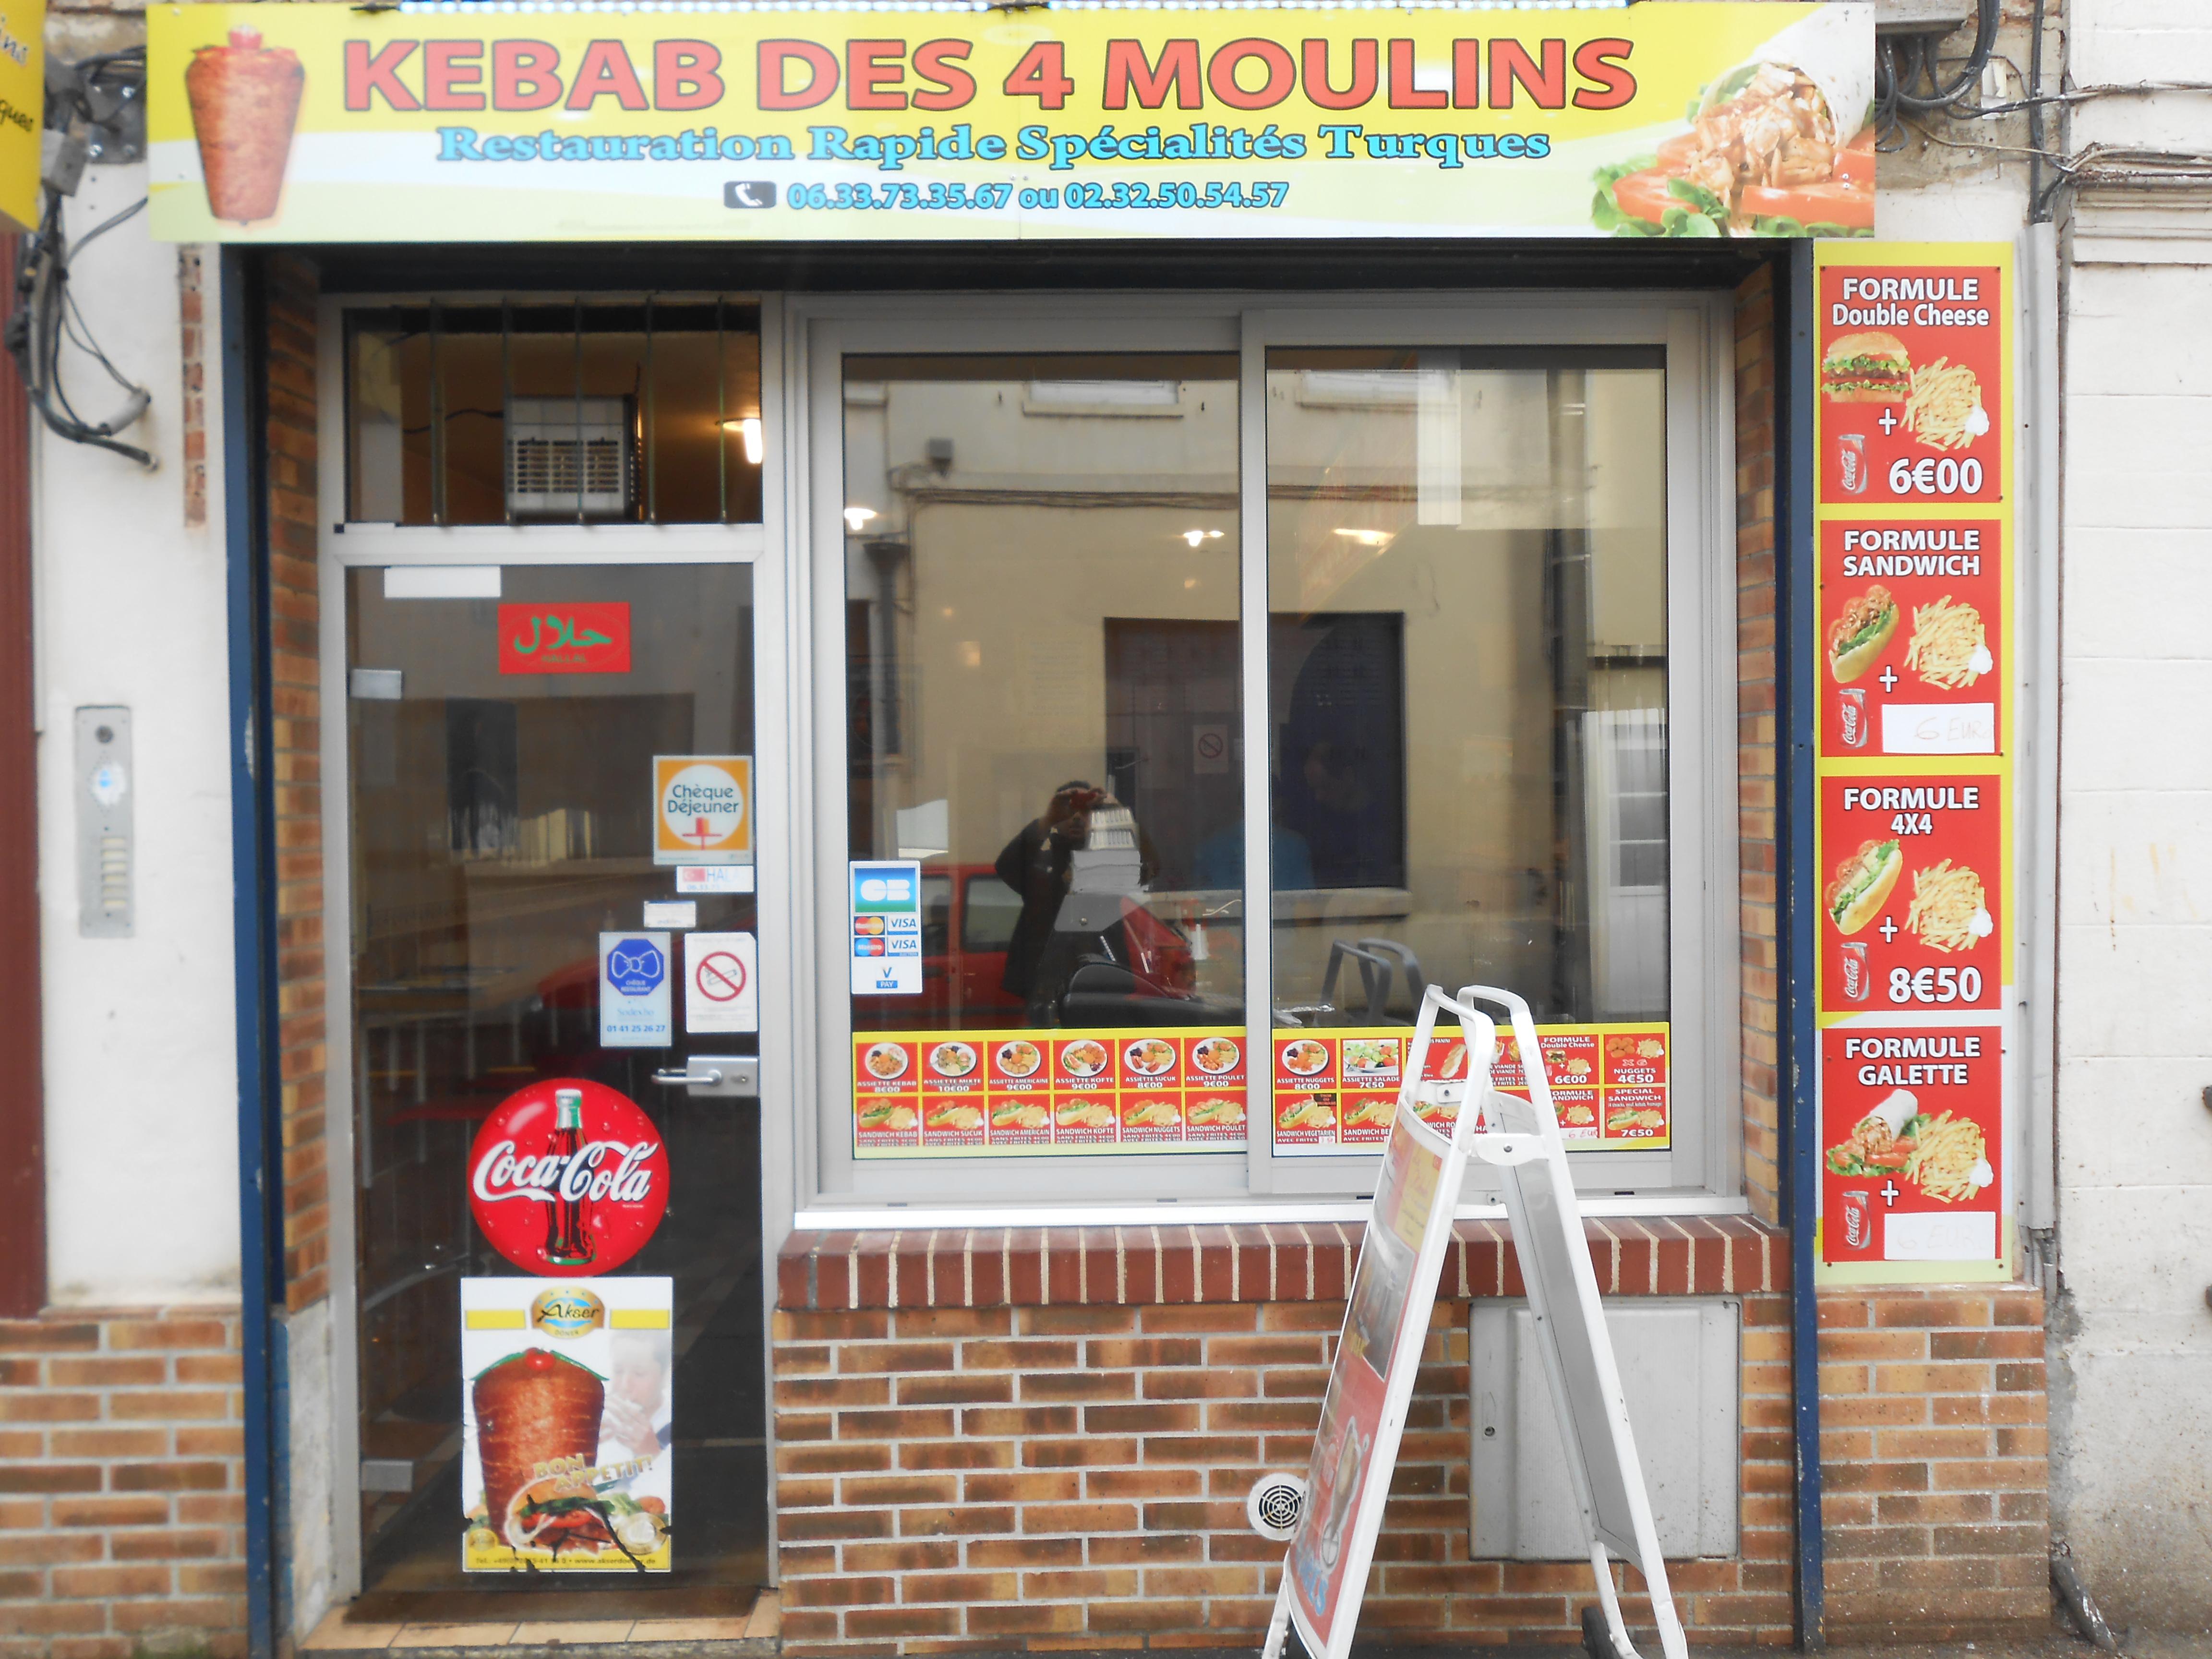 Le Kebab des 4 moulins